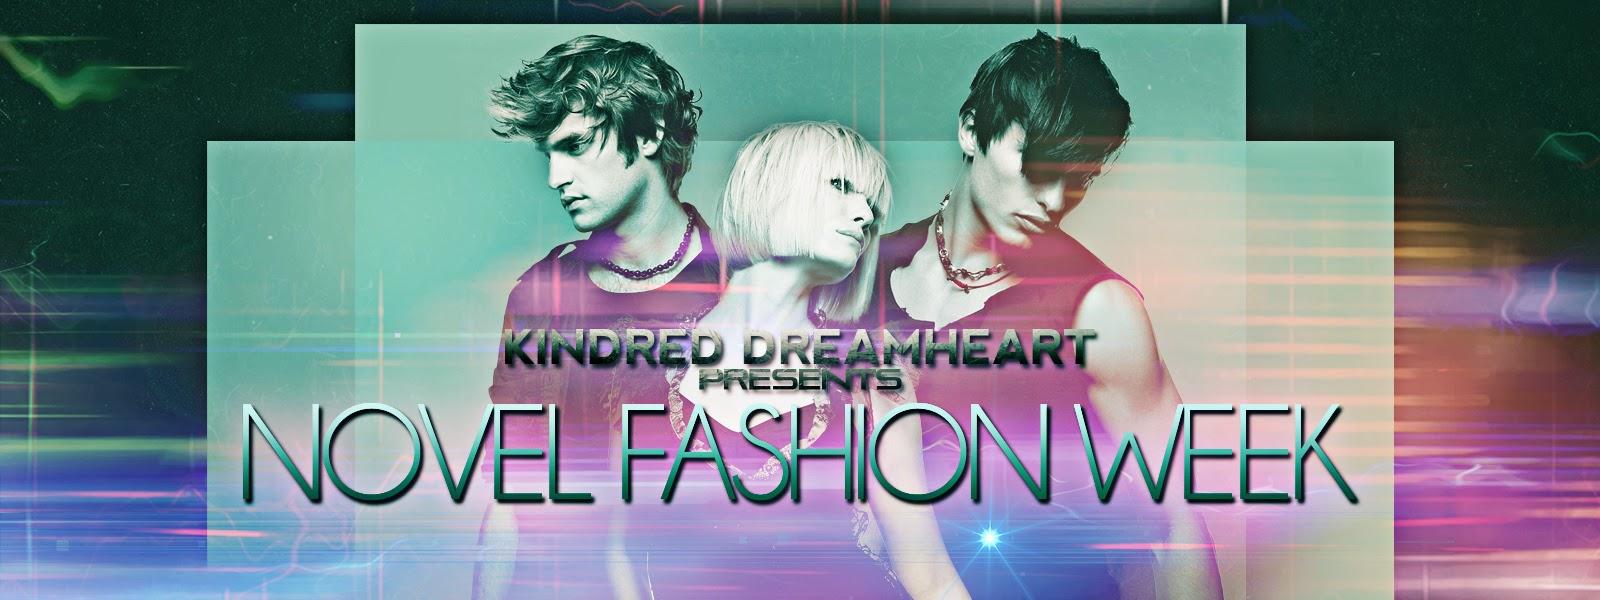 Novel Fashion Week